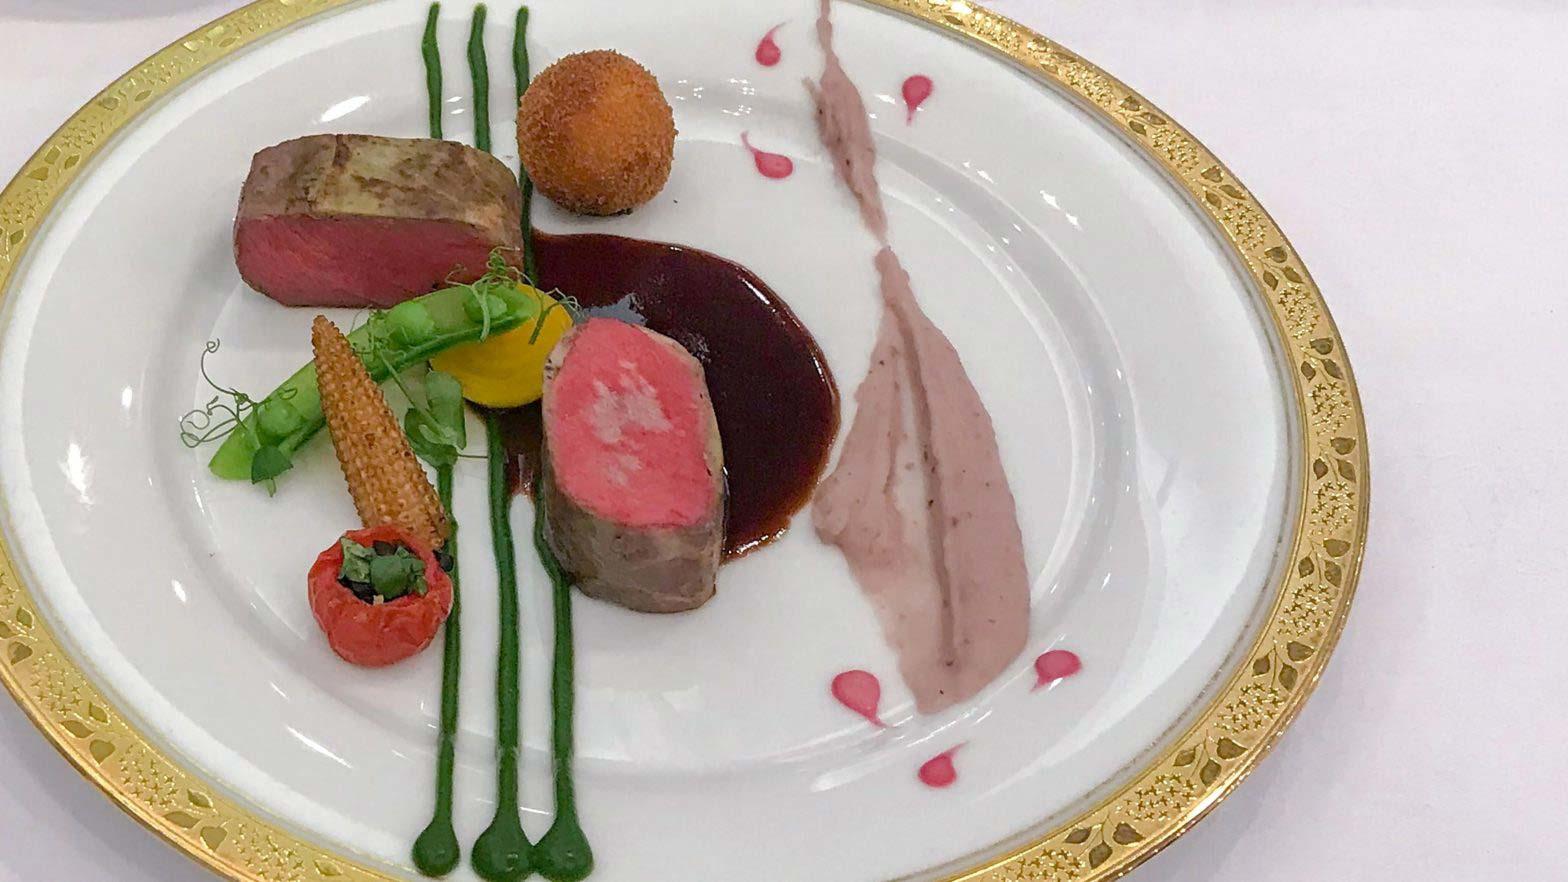 Ryo Yokohama won the Hokkaido Governor Award at the 2019 15th IH Challenge Cooking Contest in Hokkaido